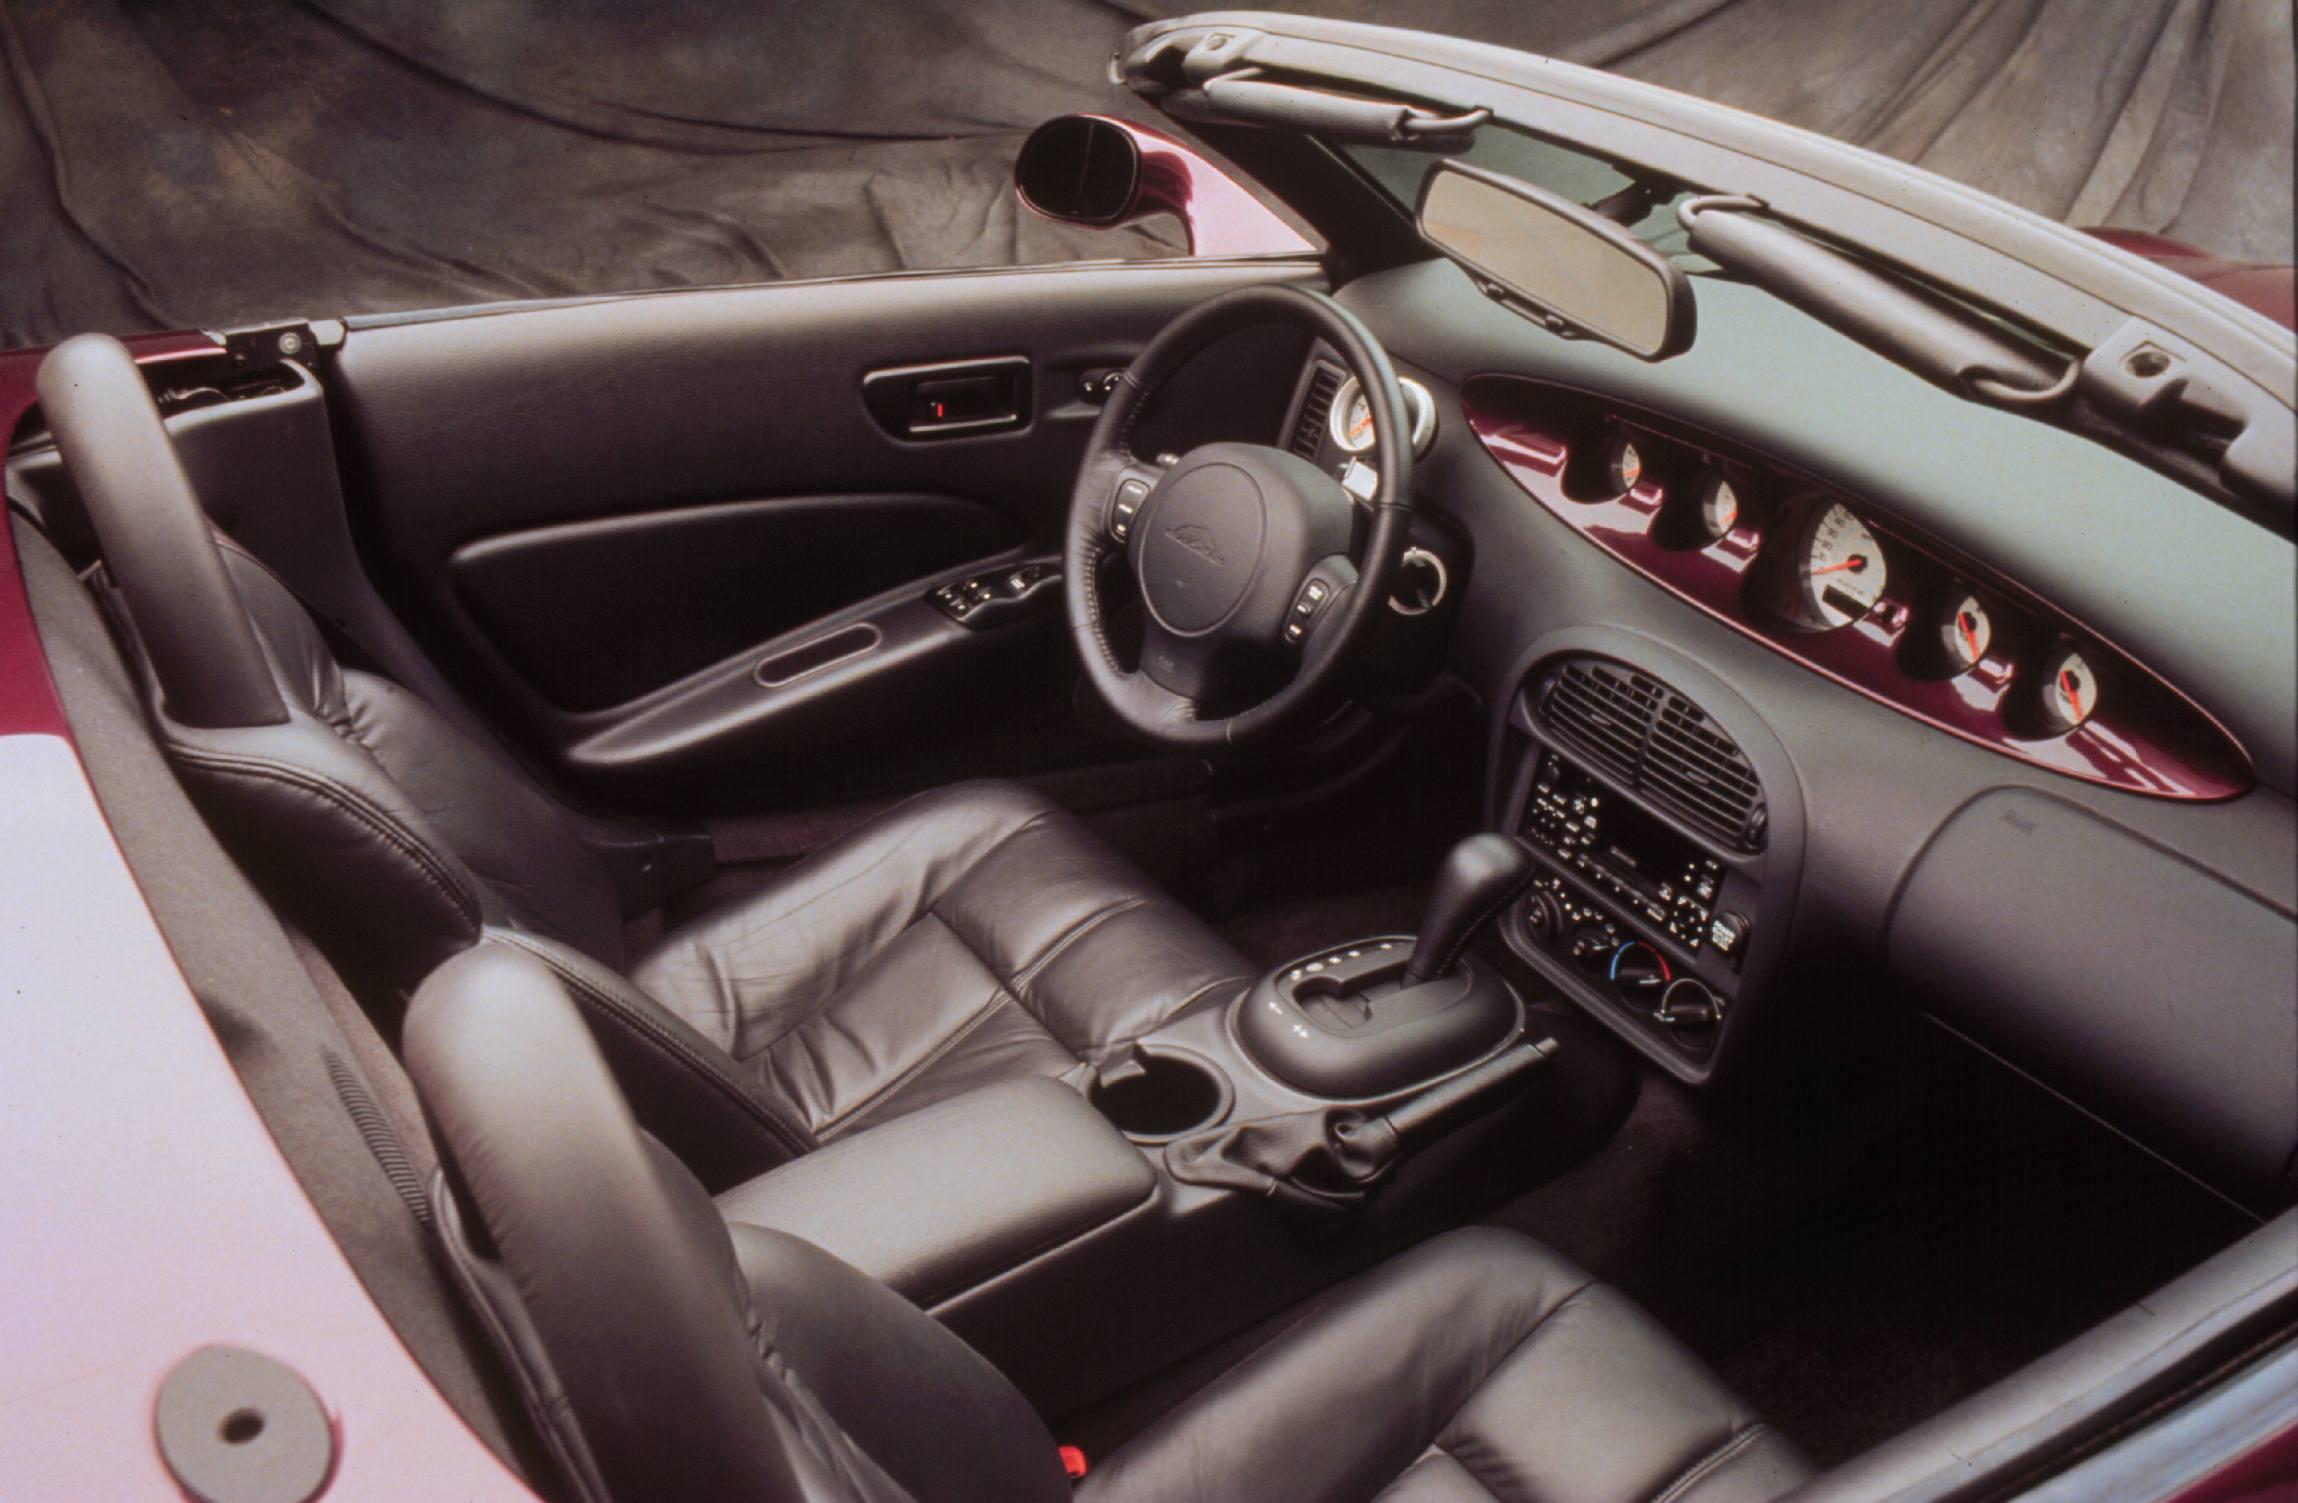 Plymouth Prowler interior